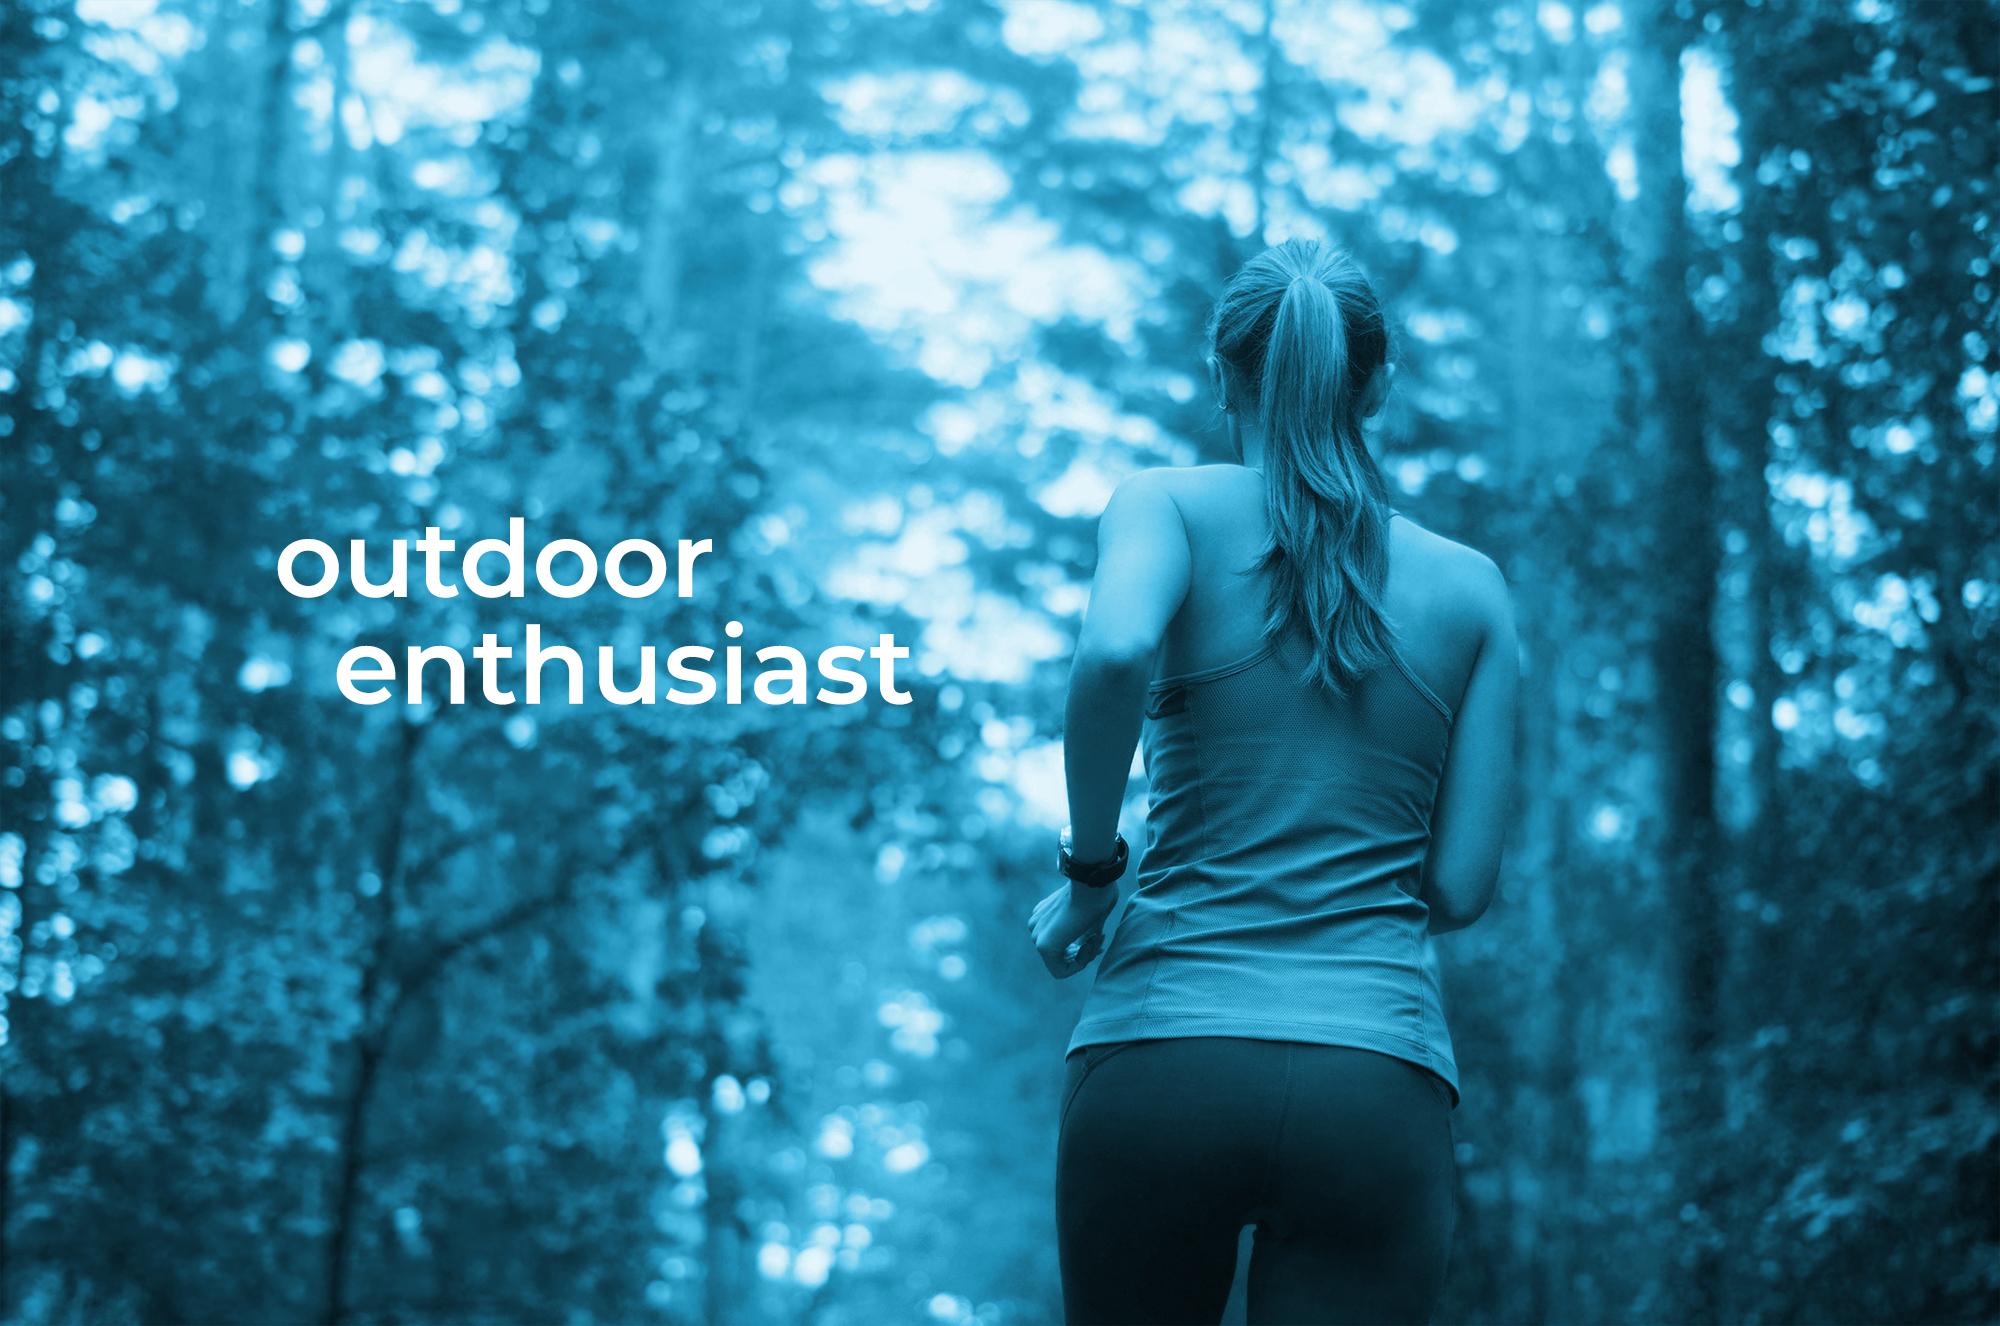 AdobeStock_Outdoor enthusiast.jpg